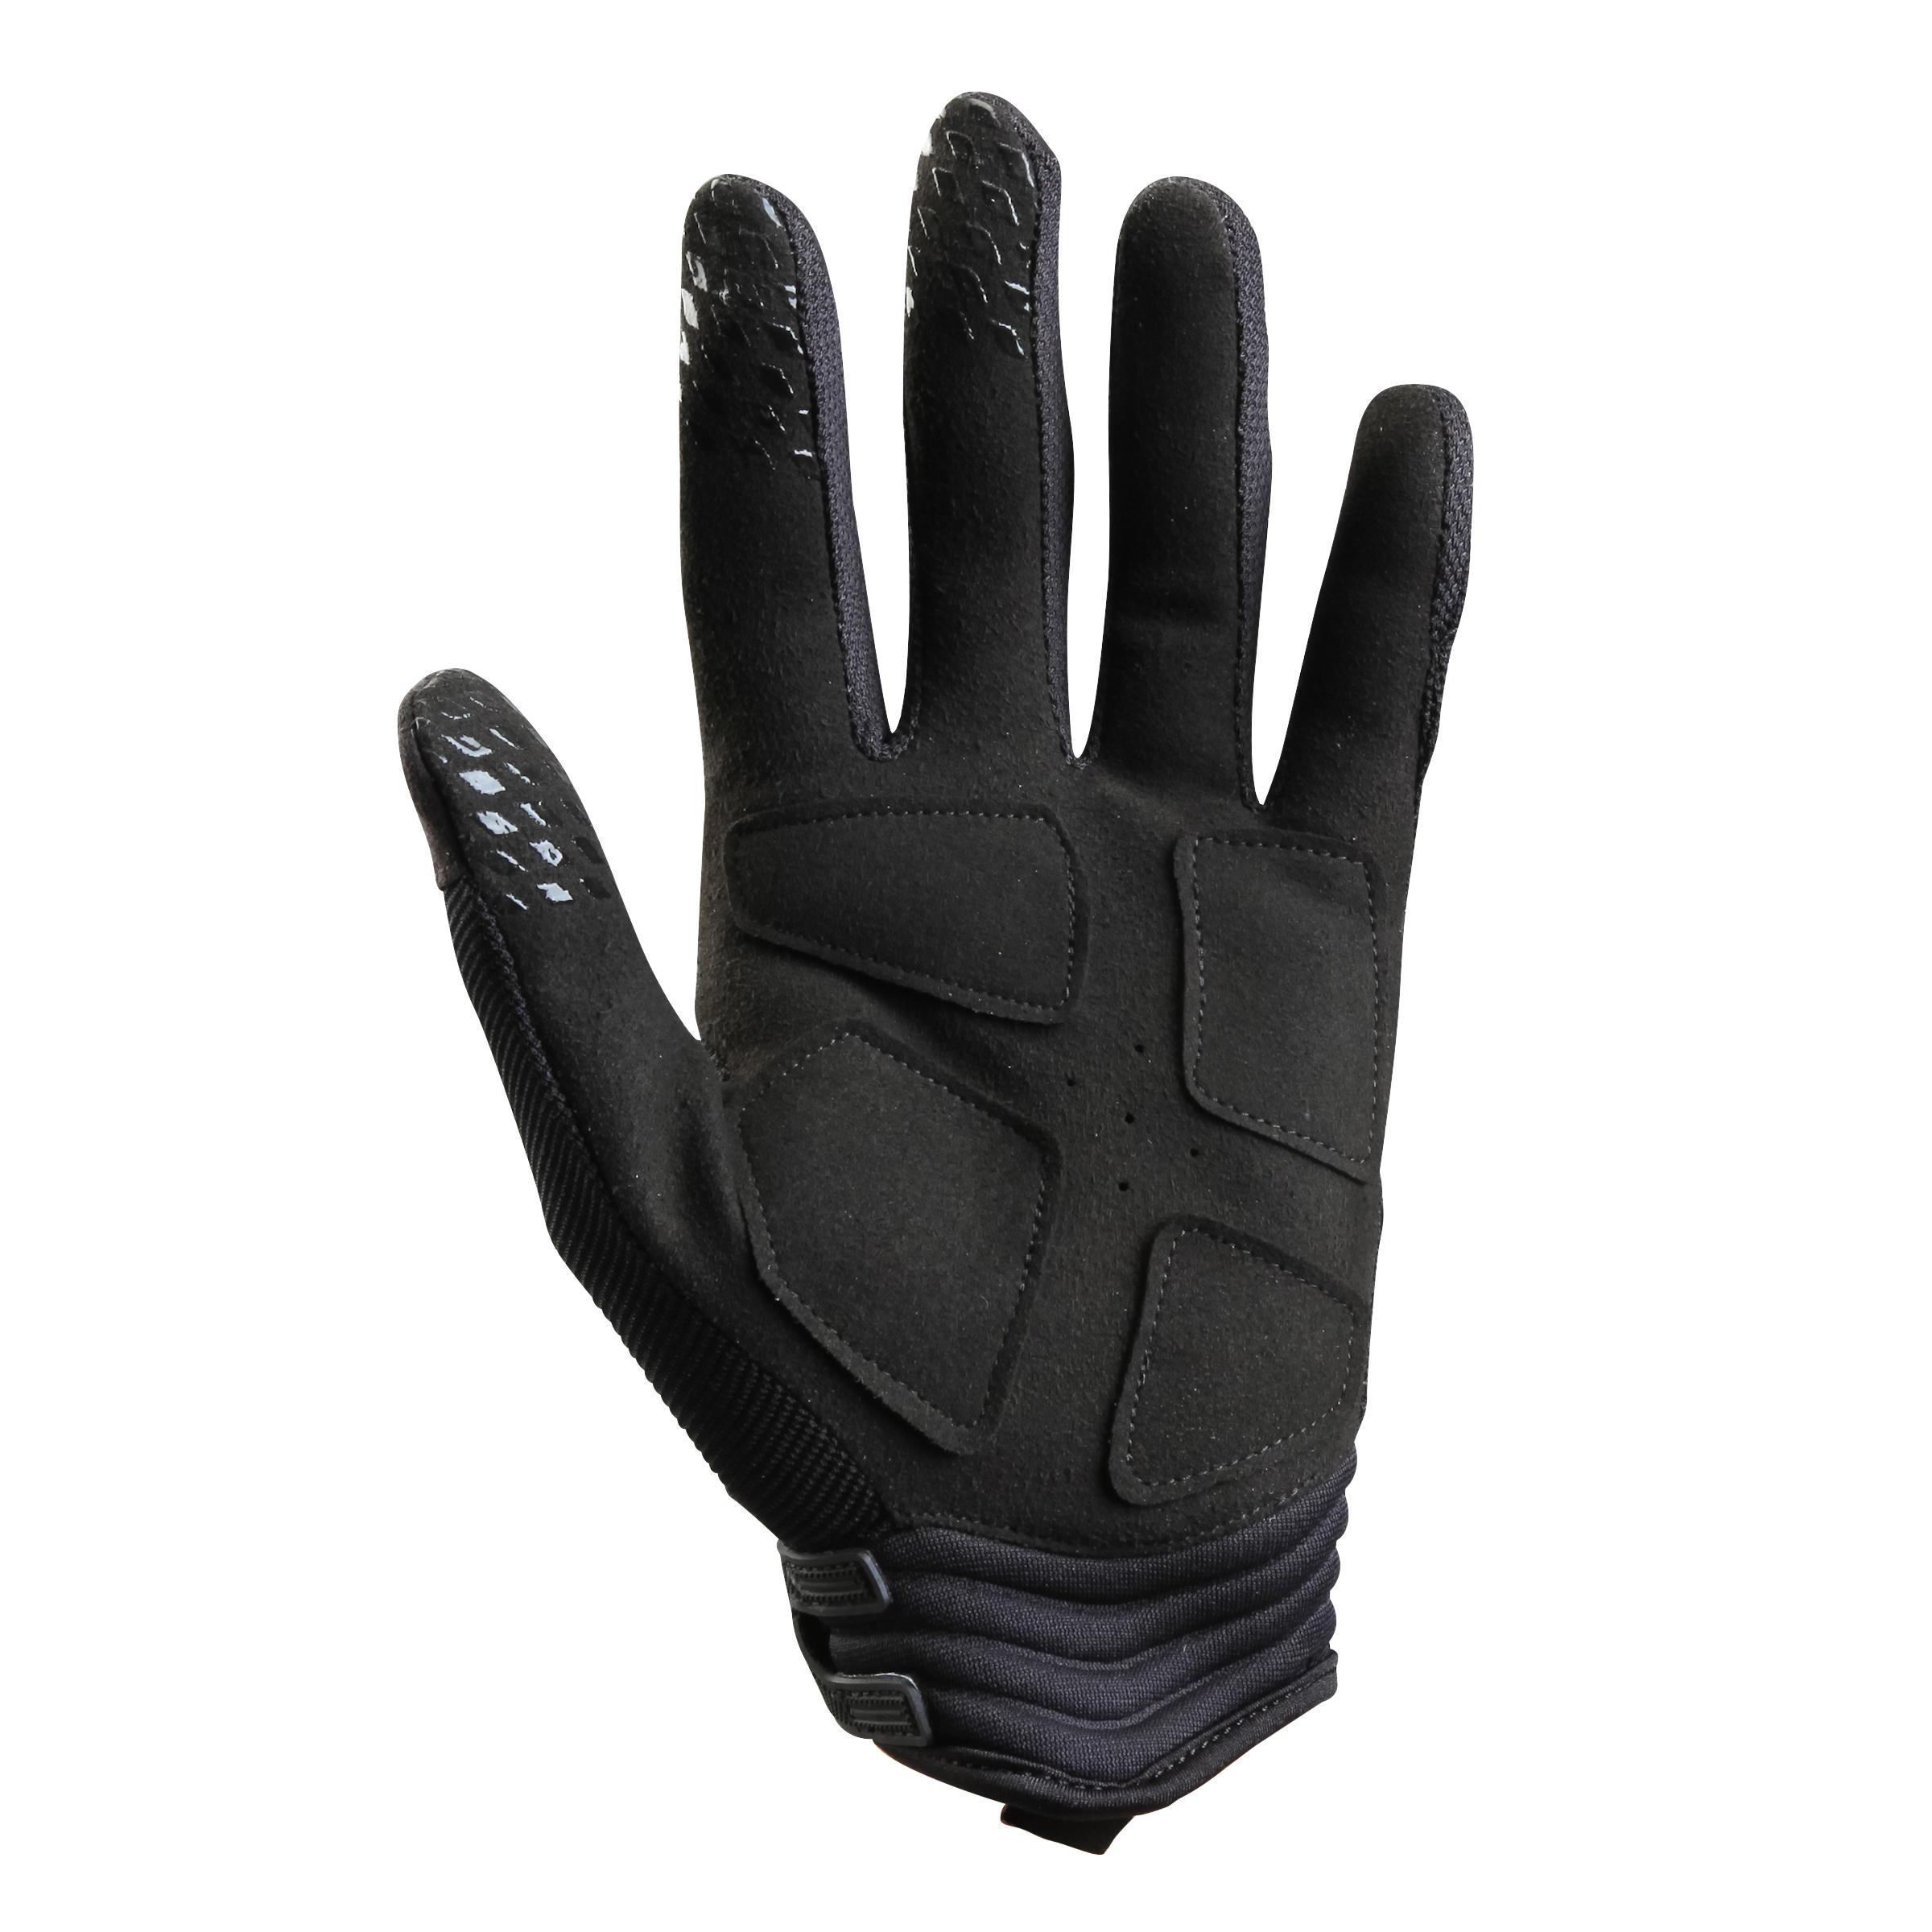 Mountain Bike Gloves -